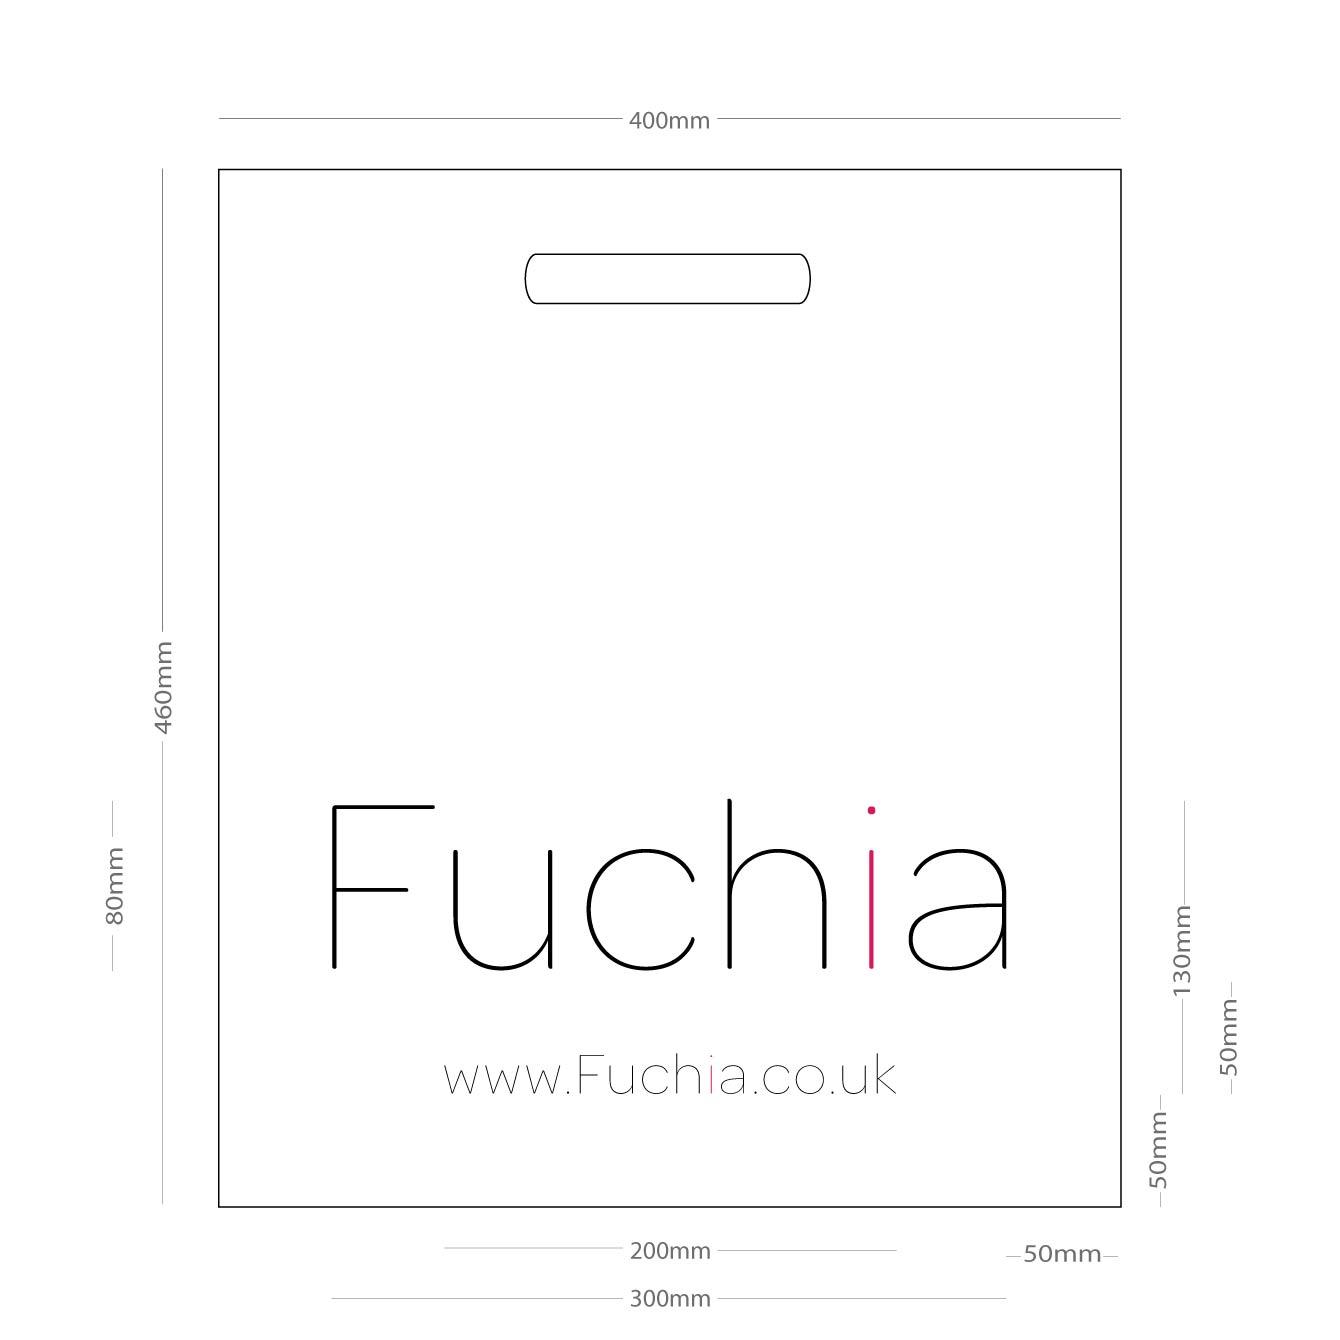 fuchia-bag-layout